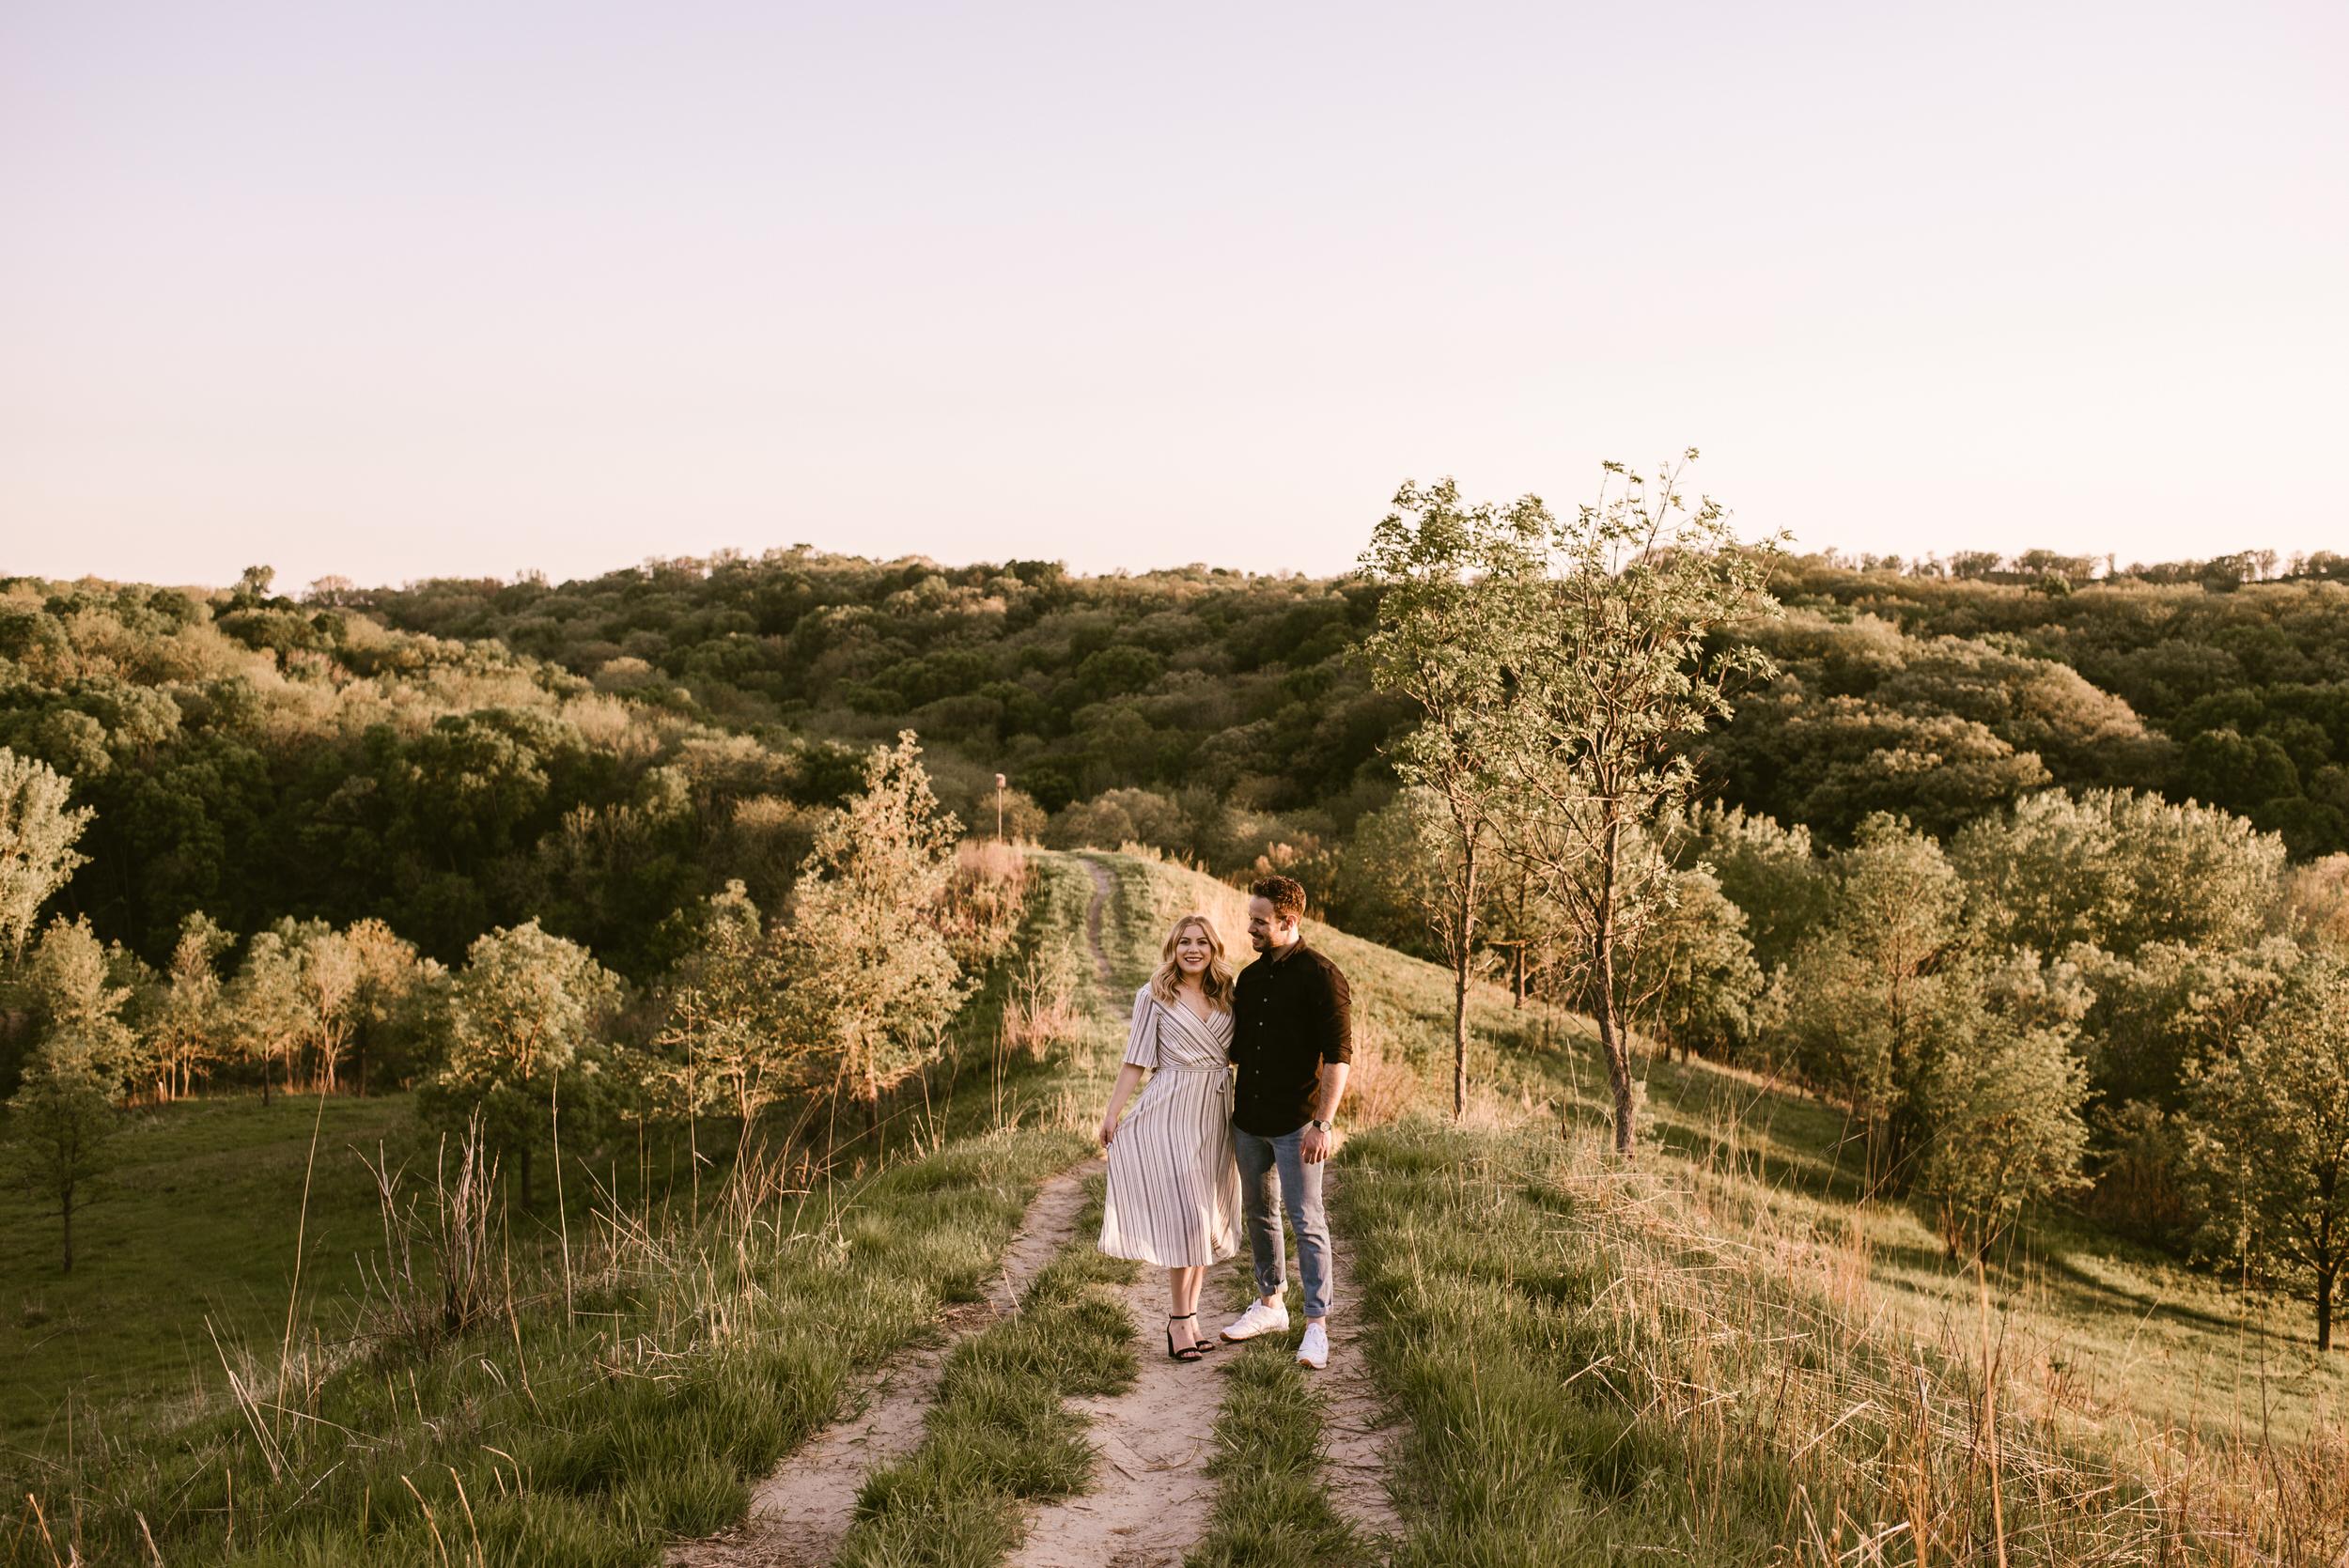 Omaha-Nebraska-Engagement-Session-Kaylie-Sirek-Photography-126.jpg